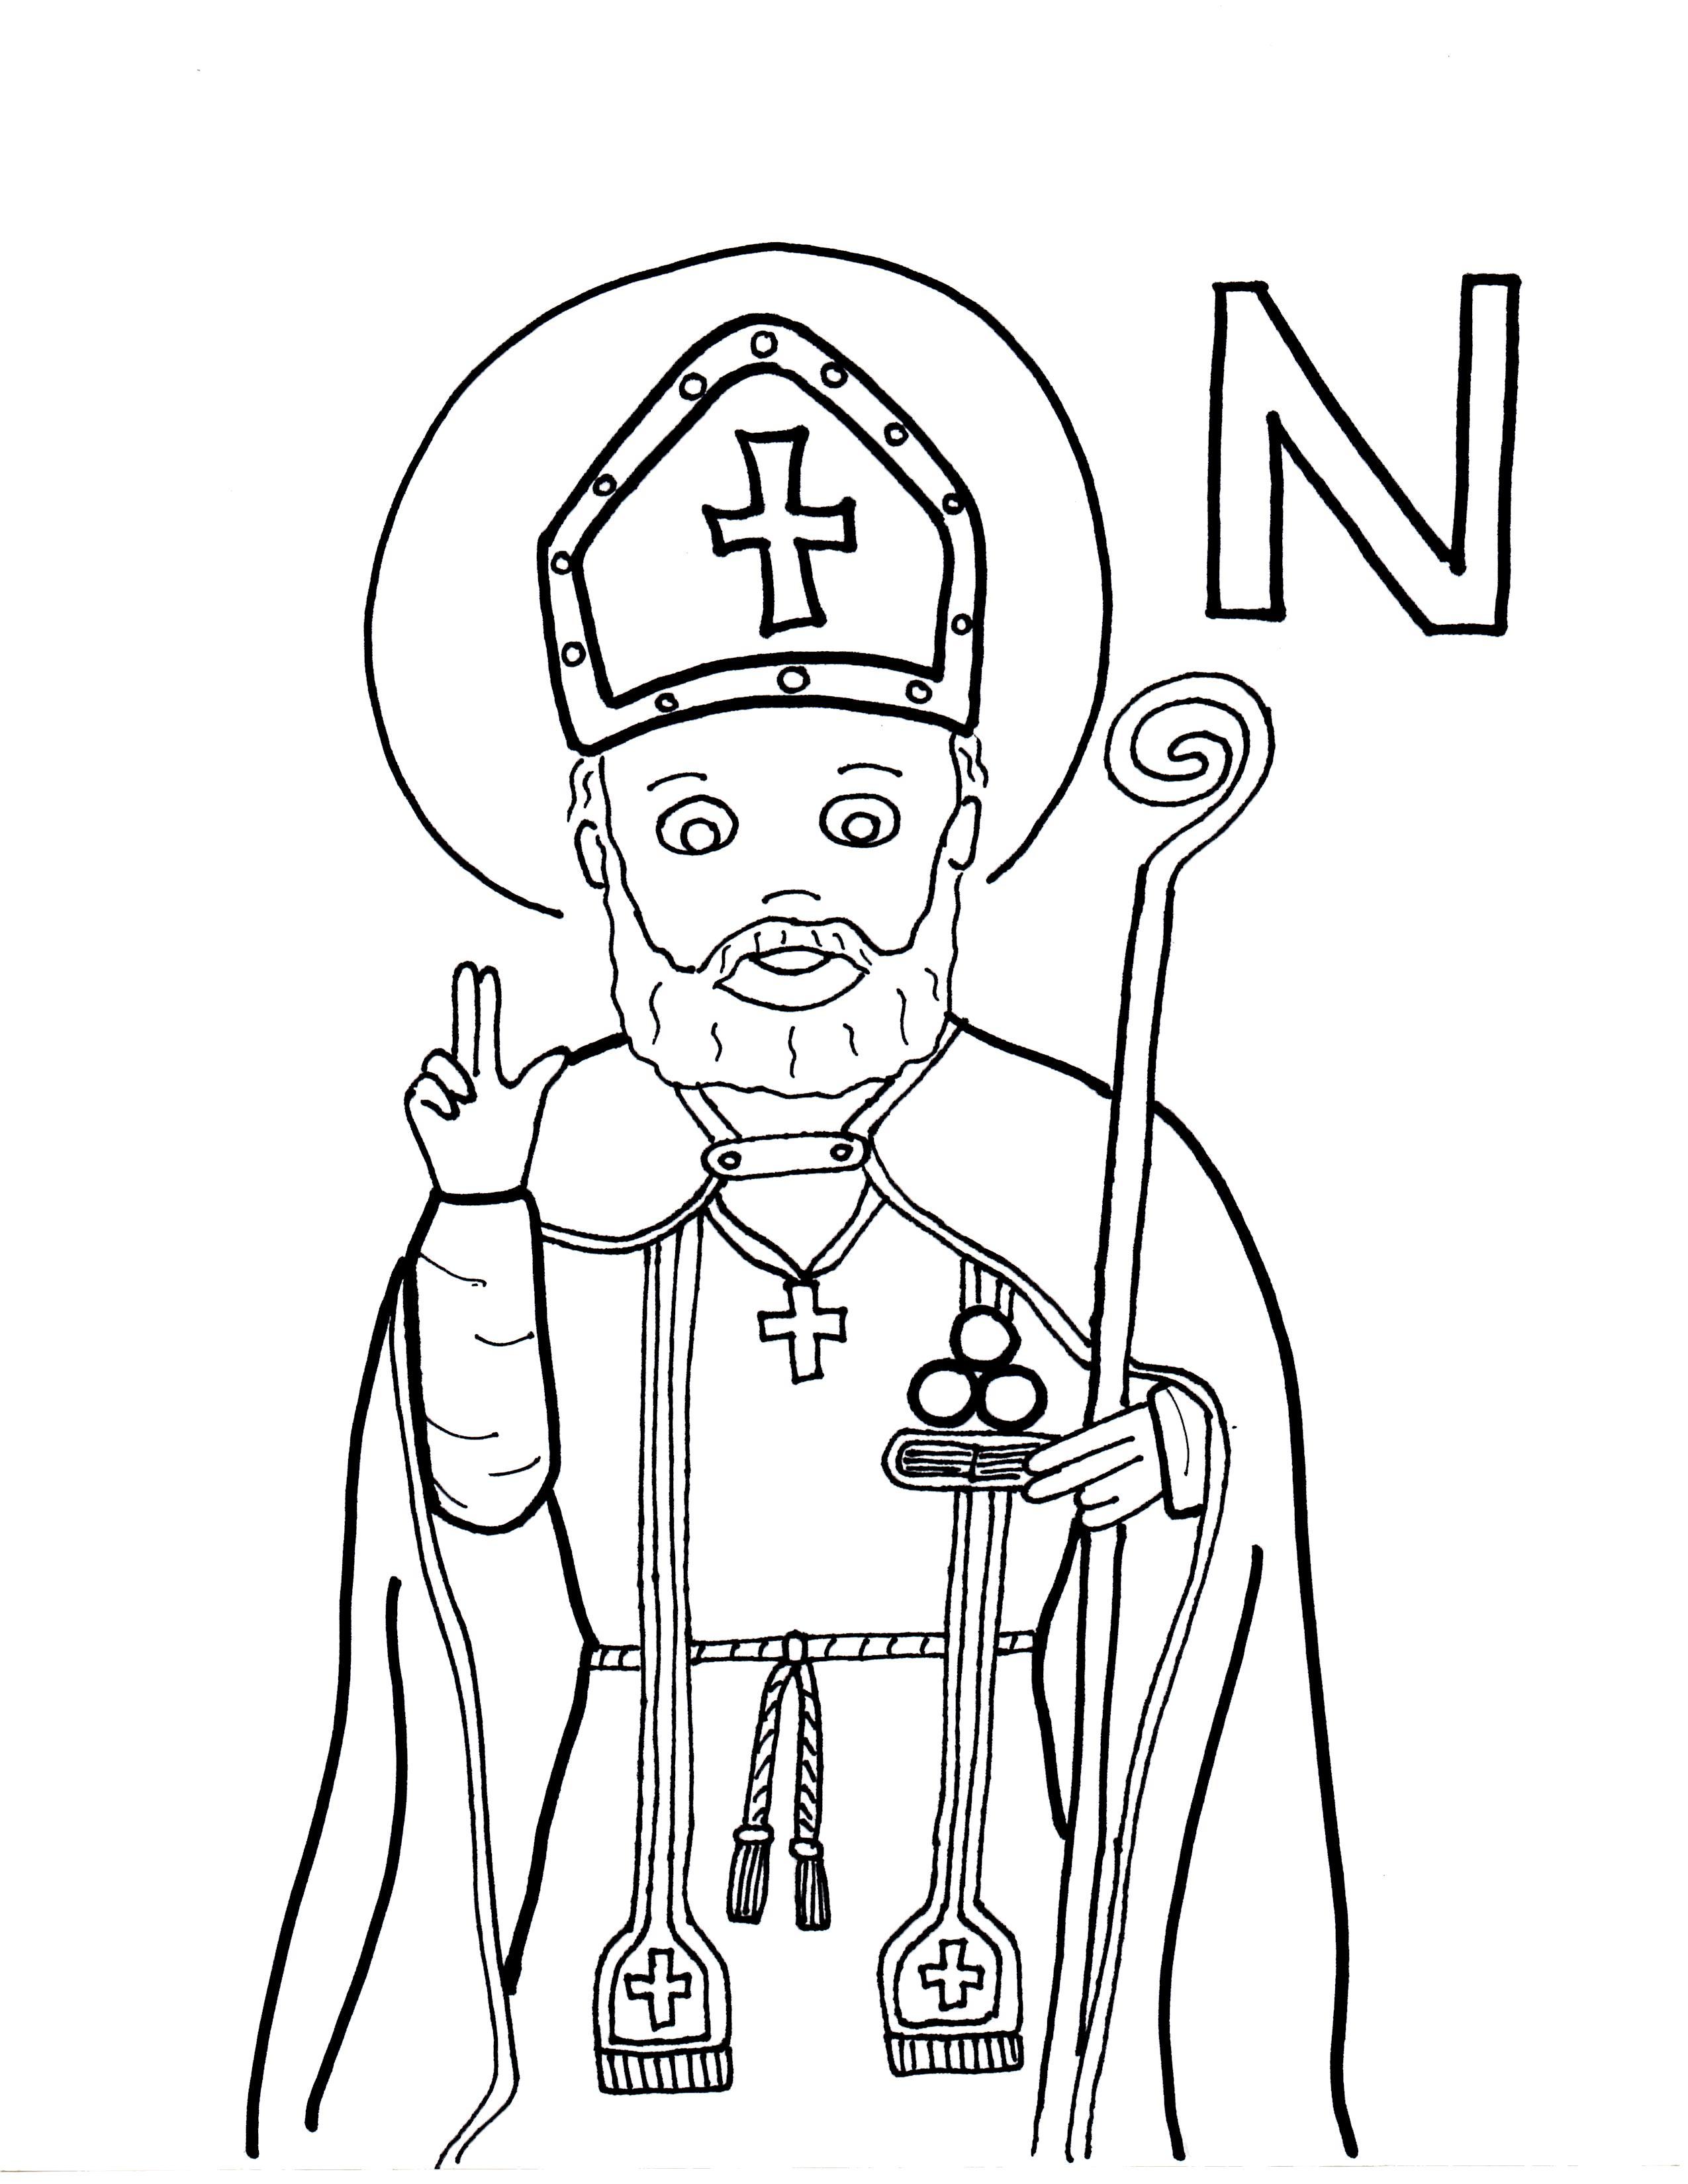 N Is For St Nicholas